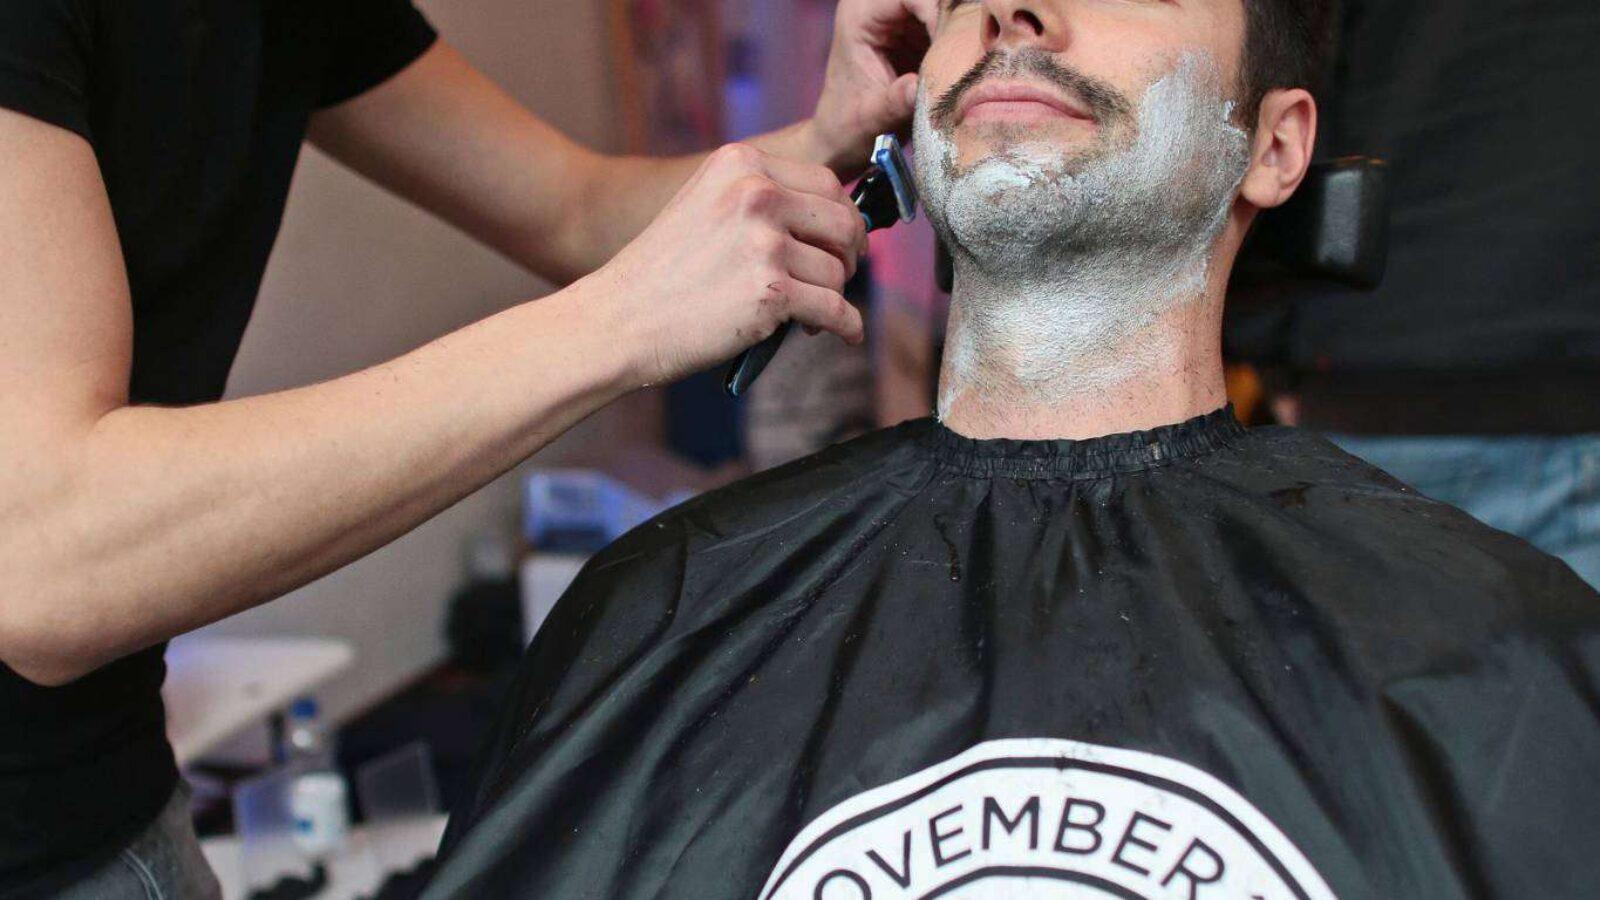 Rückbericht: MOVEMBER – Shave Off Event am 30.10.